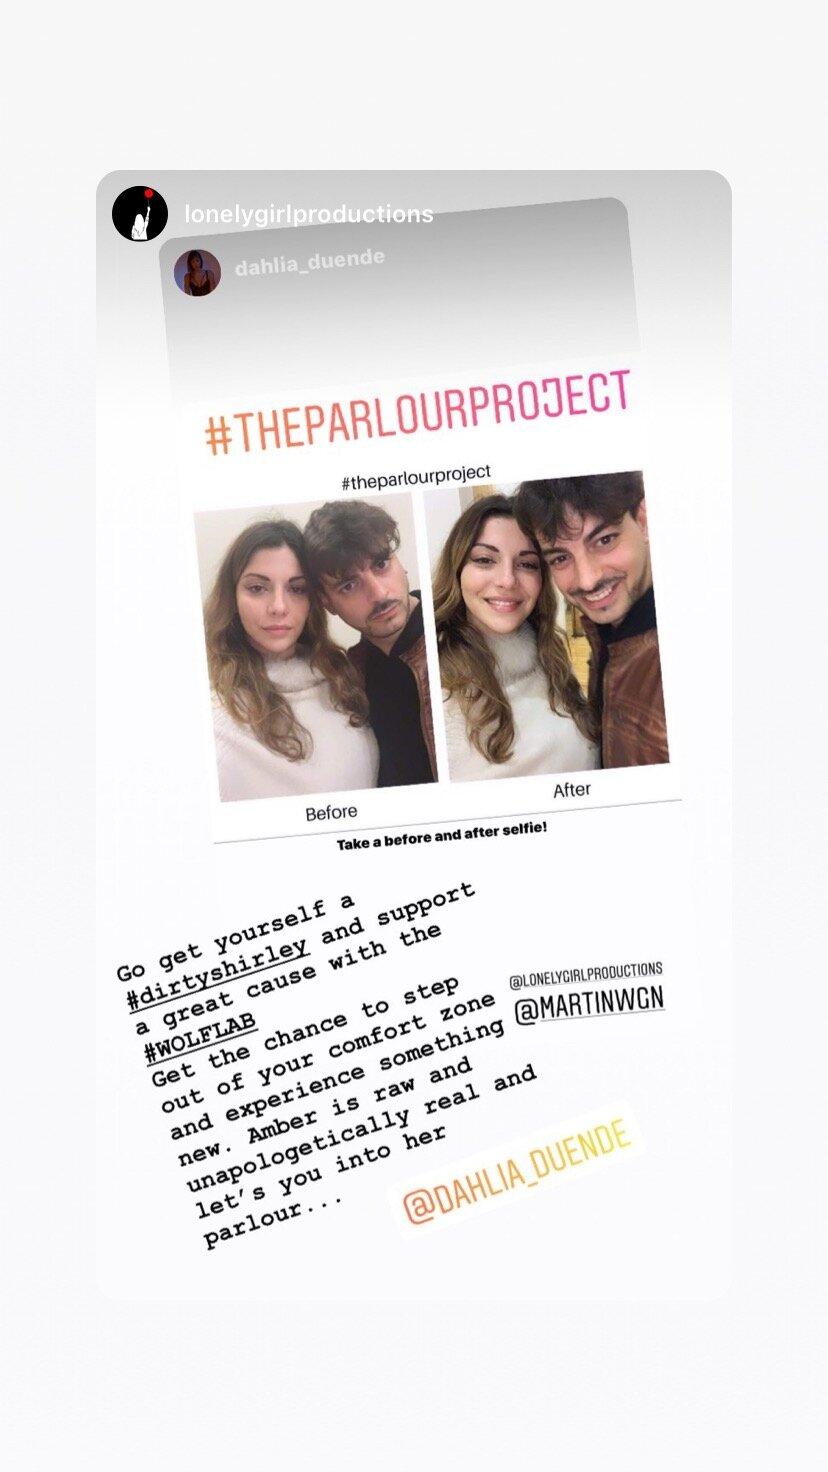 The Parlour Project Testimonial 09:27.jpg